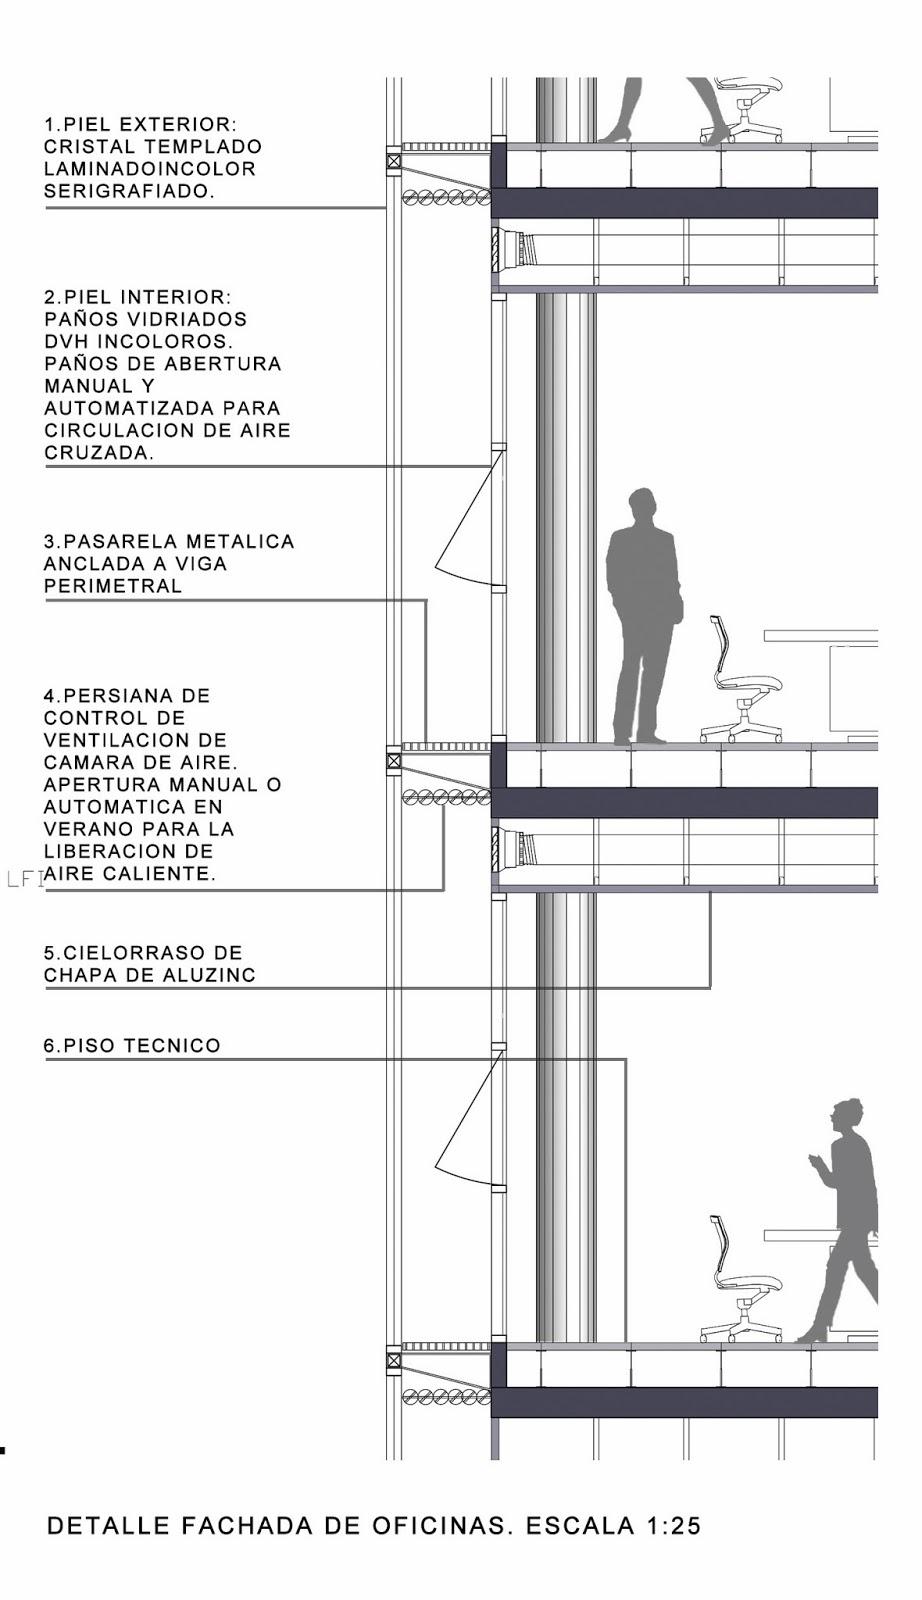 Obas arquitectos concursos for Piso tecnico detalle